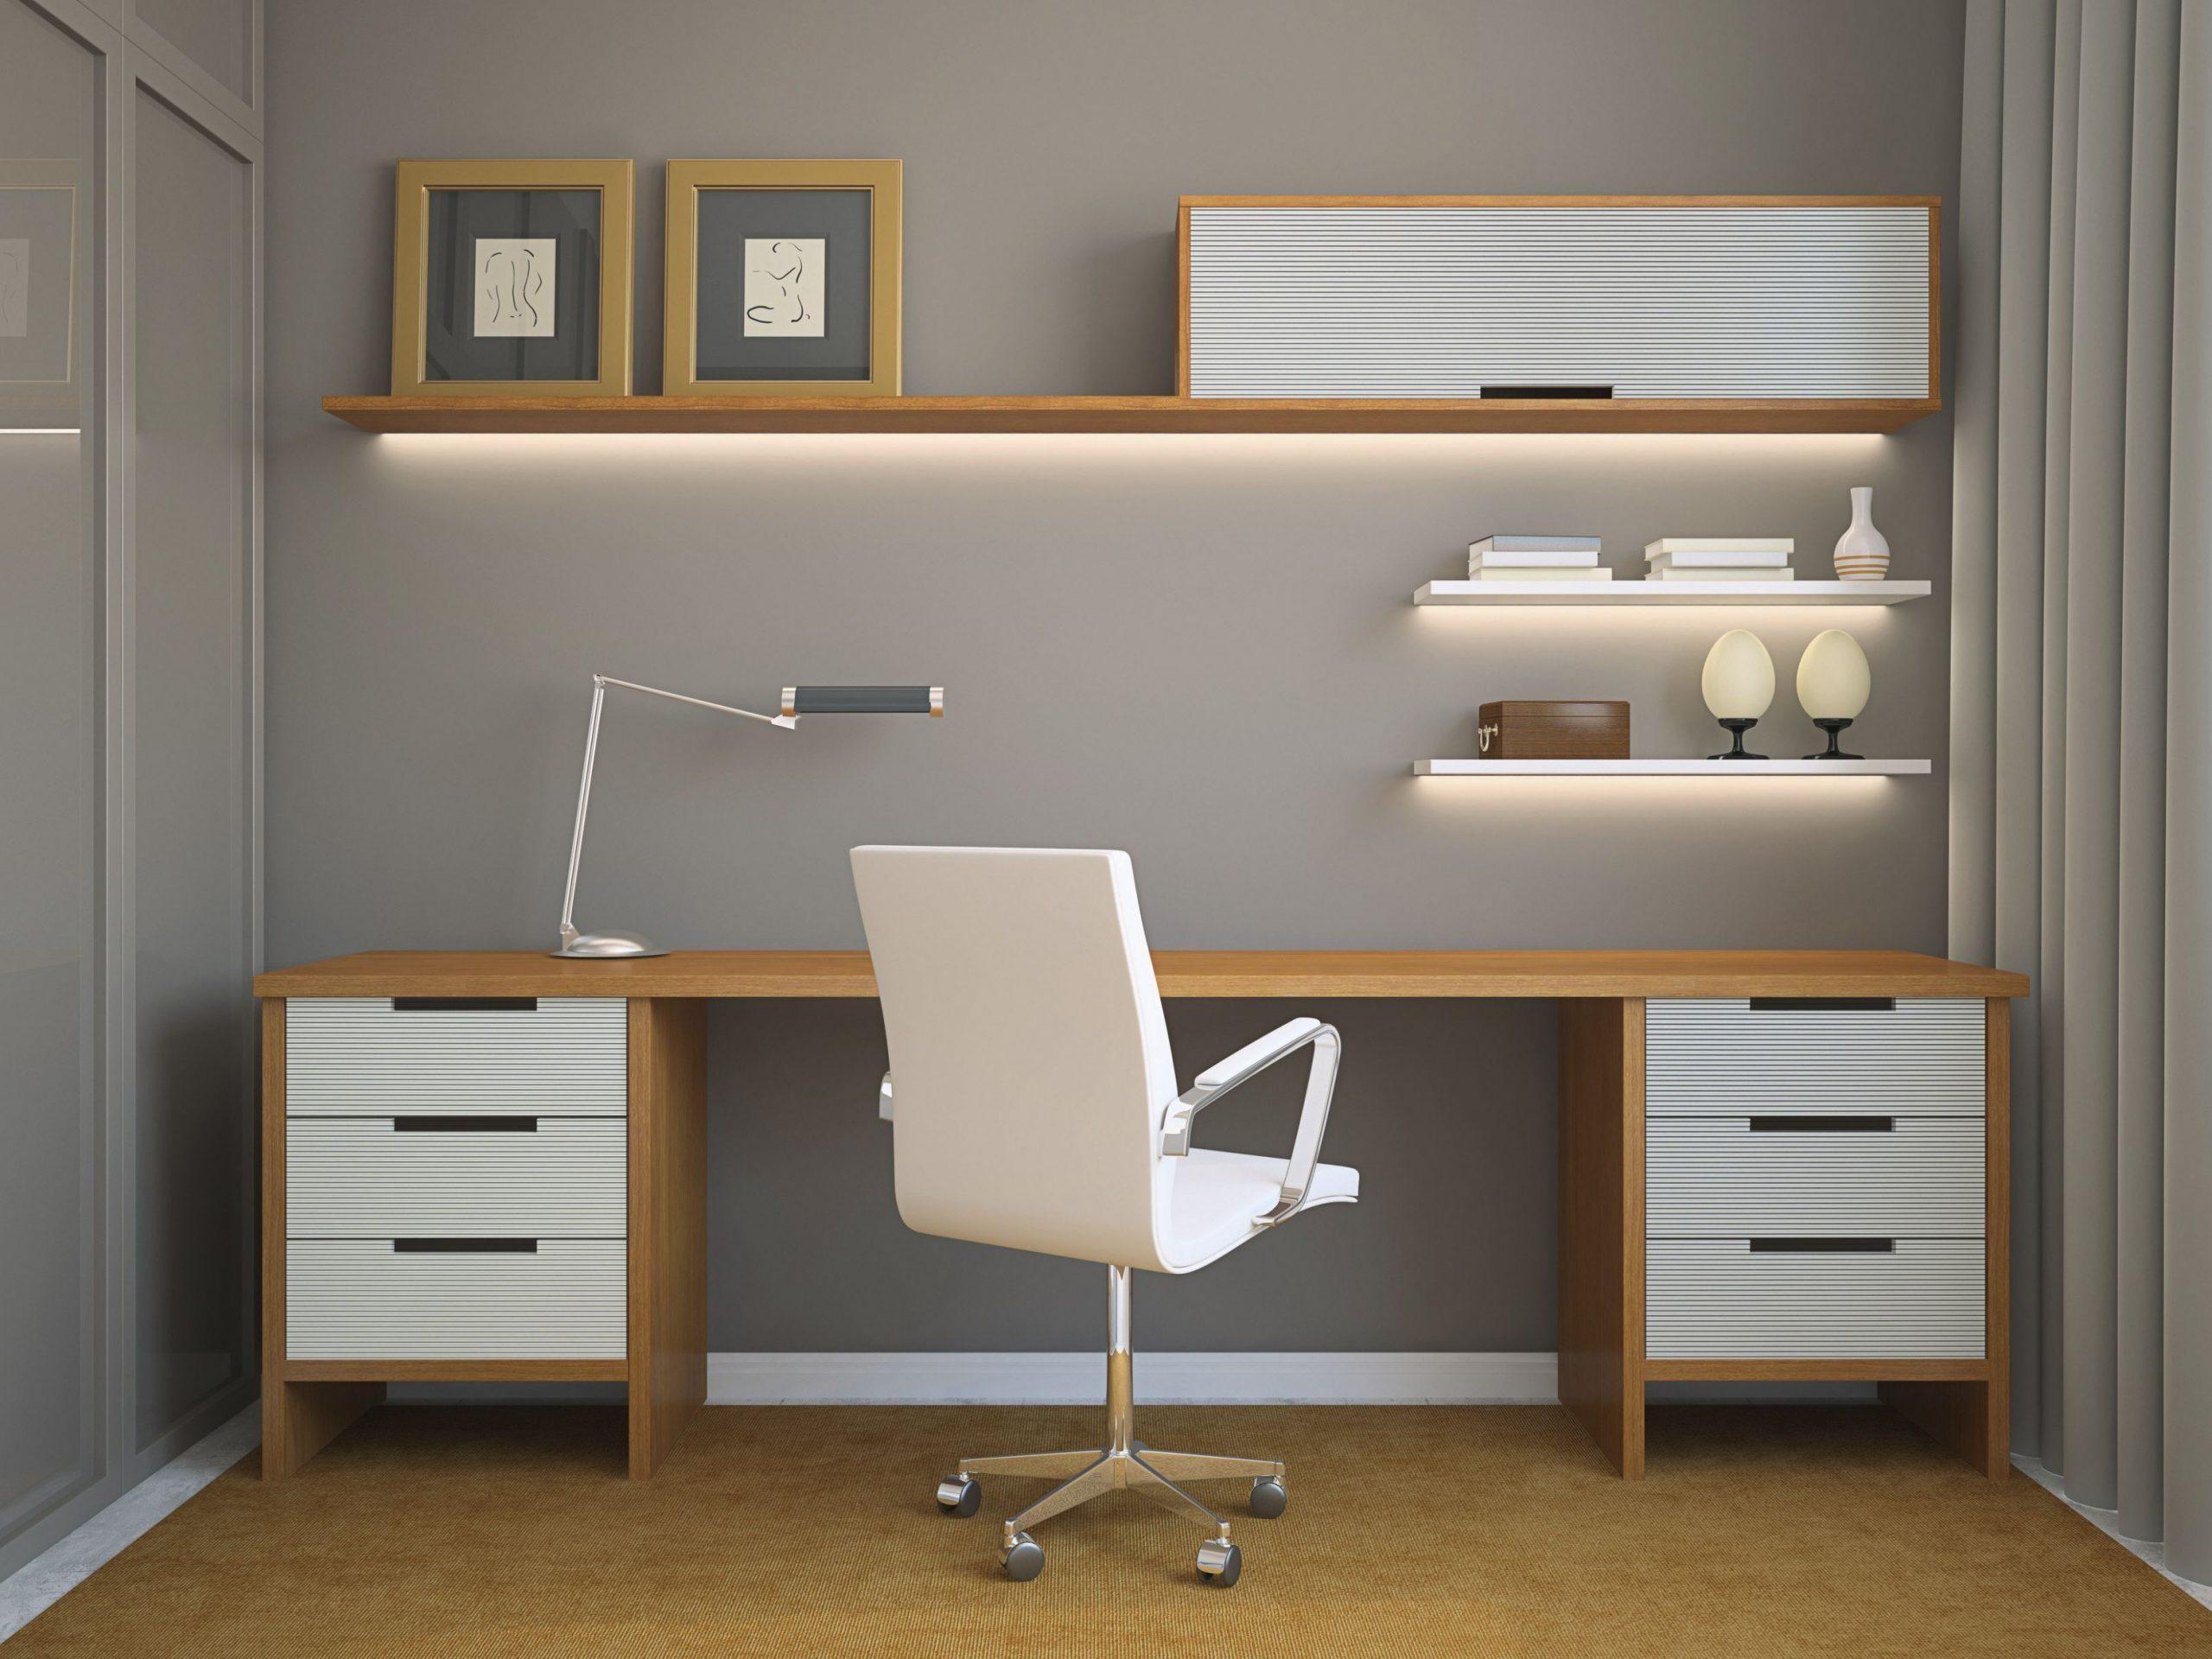 Office Ikea Office Ideas Pinterest Small Interior Design Pictures  - Home Office Ideas On Pinterest